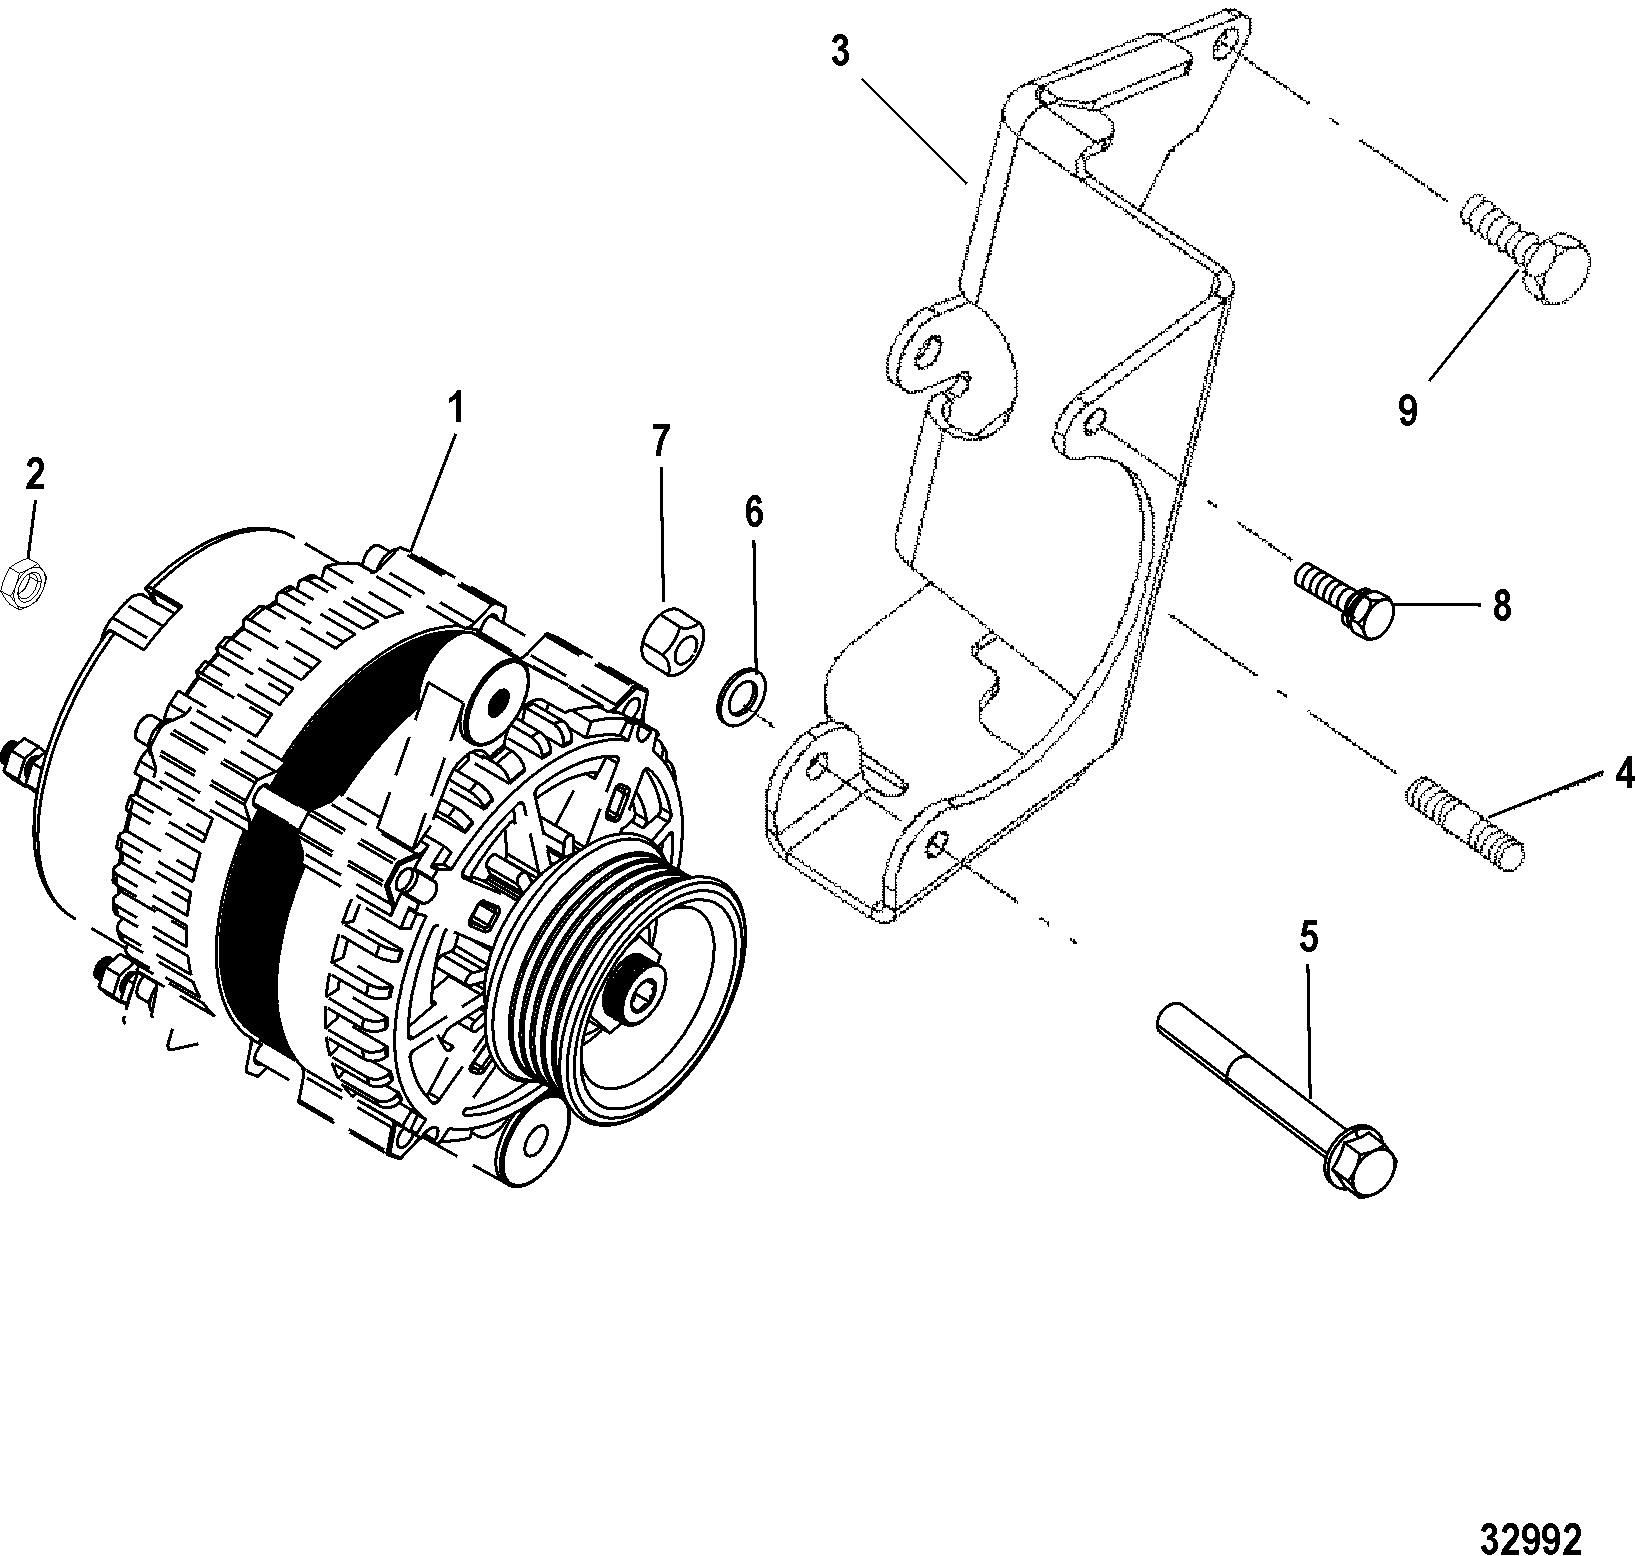 Alternator And Bracket Delco For Mie 7 4l Mpi Mie Gen Vi L29